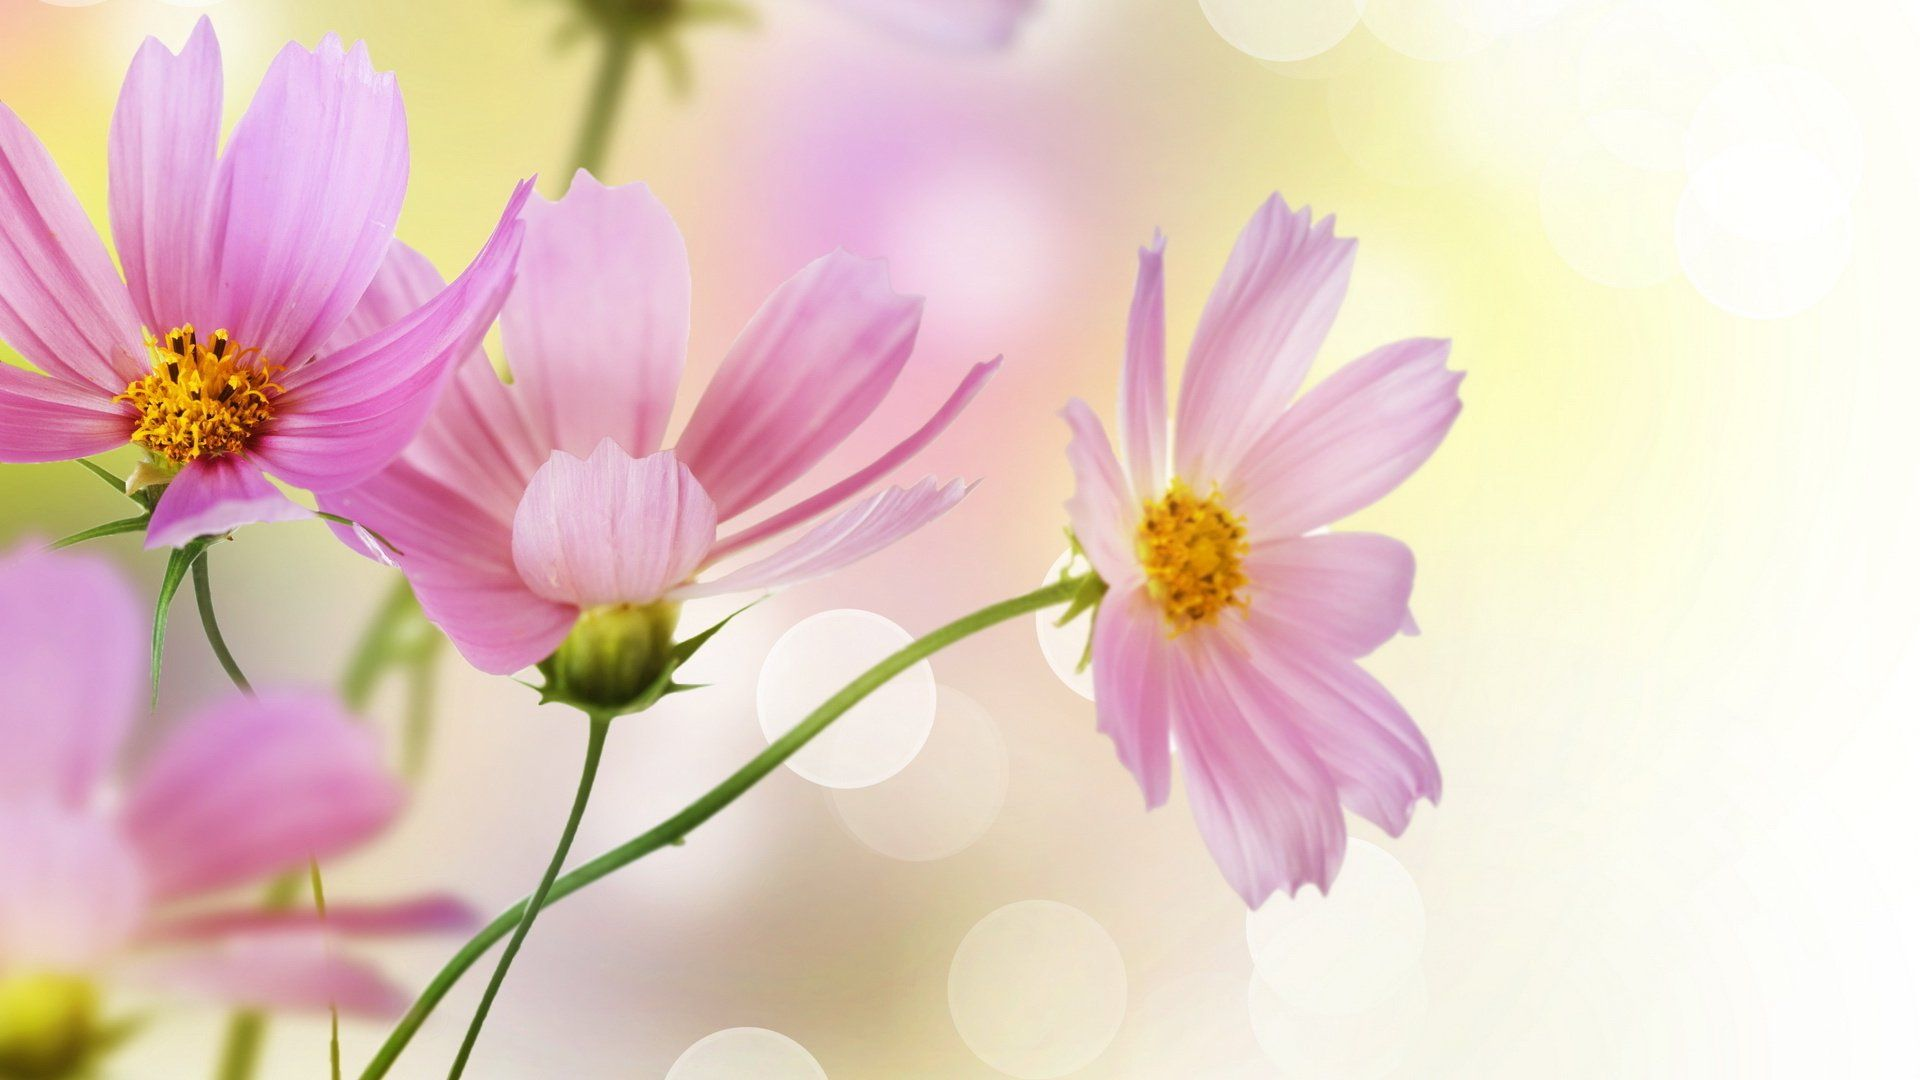 ромашки розовые белые chamomile pink white  № 1037972 без смс